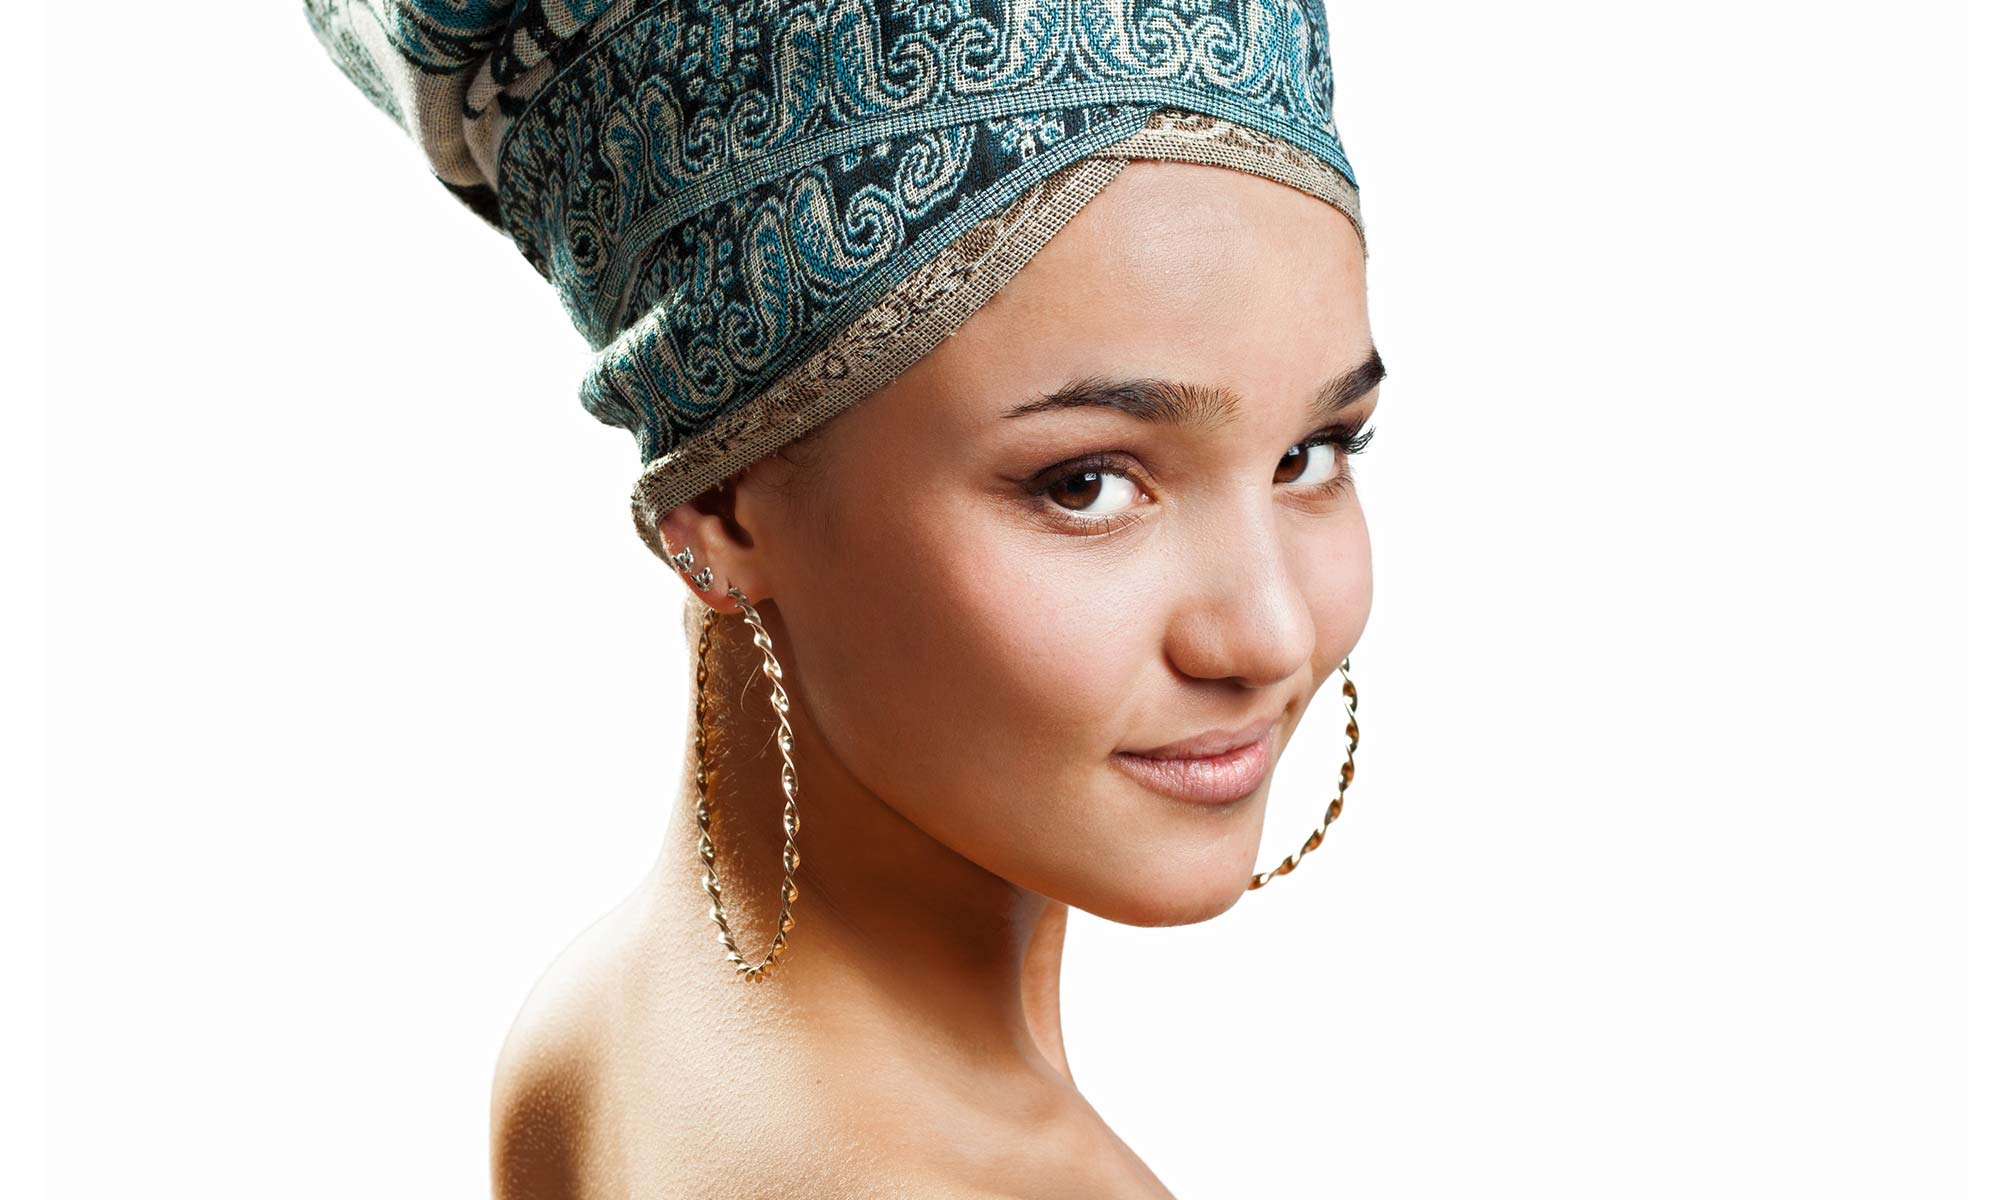 Turbans and Head Wraps